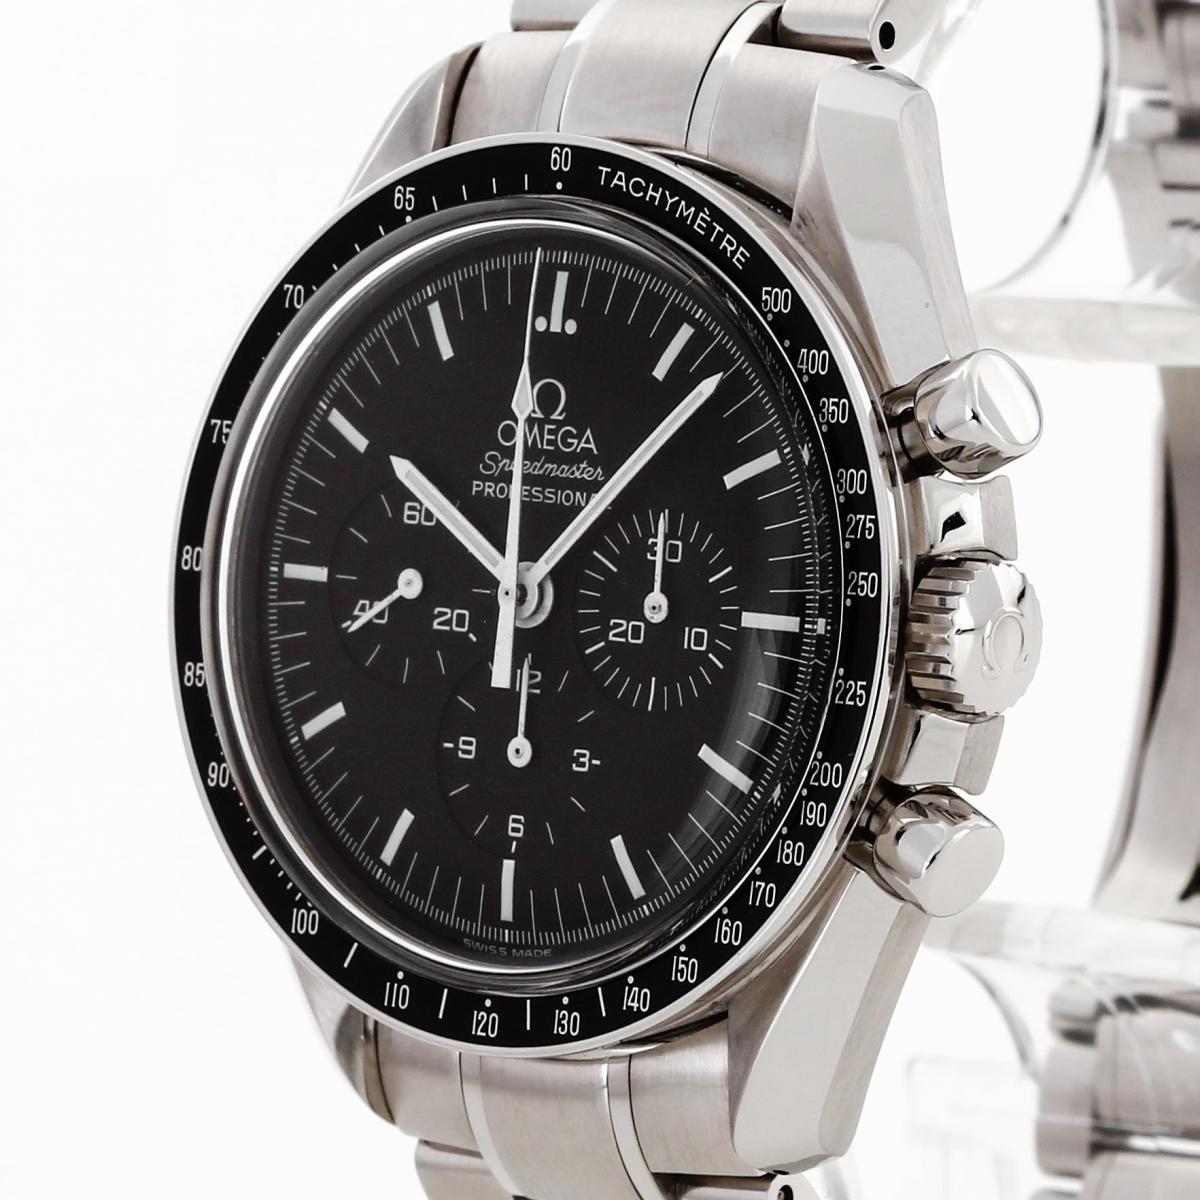 Omega Speedmaster Moonwatch Apollo XI L.E. Ref. 35605000